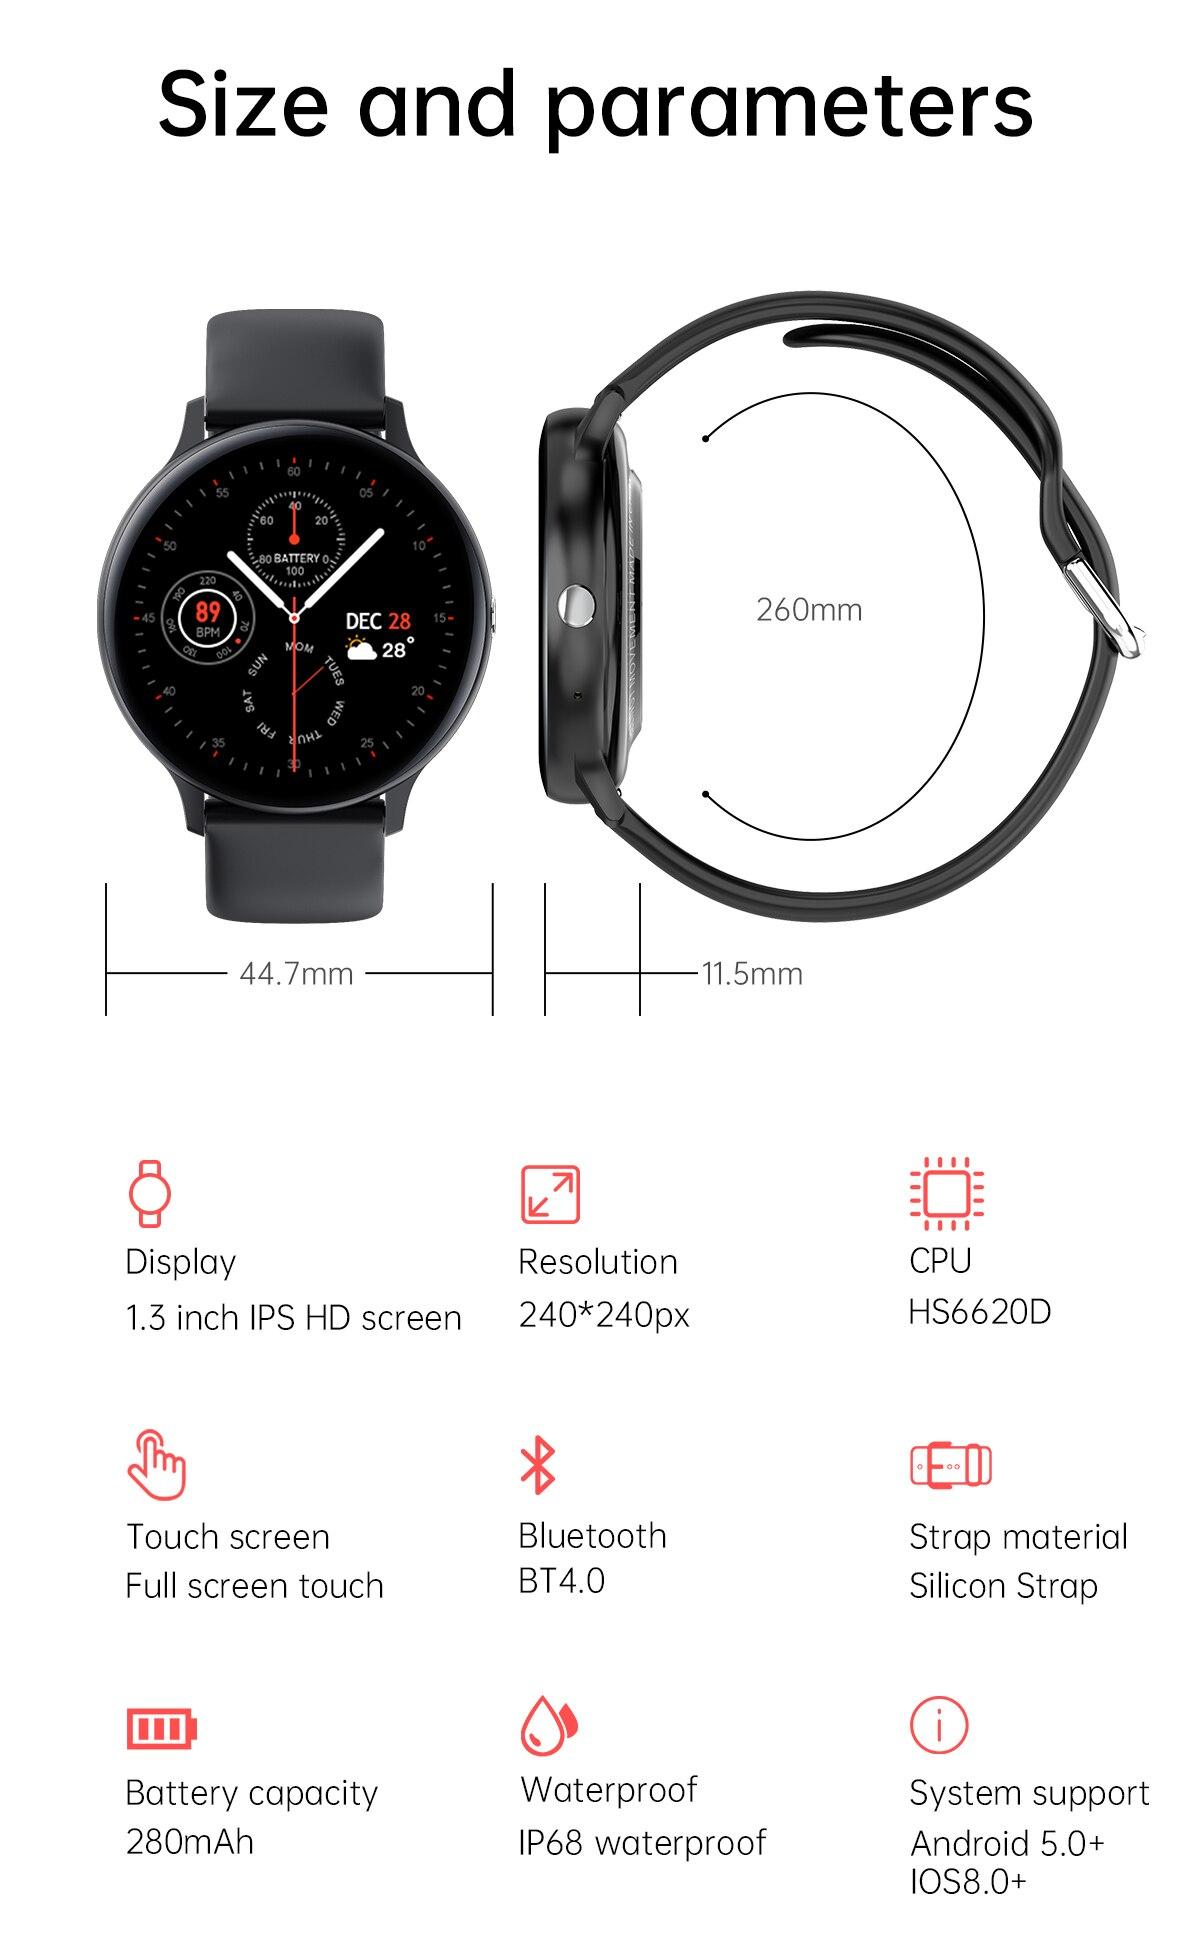 He9a30d7aa9b24ba39074b7aa65508c002 LIGE 2021 New Bluetooth call smart watch men women Sport mode Heart rate and blood pressure monitor Activity tracker Smartwatch